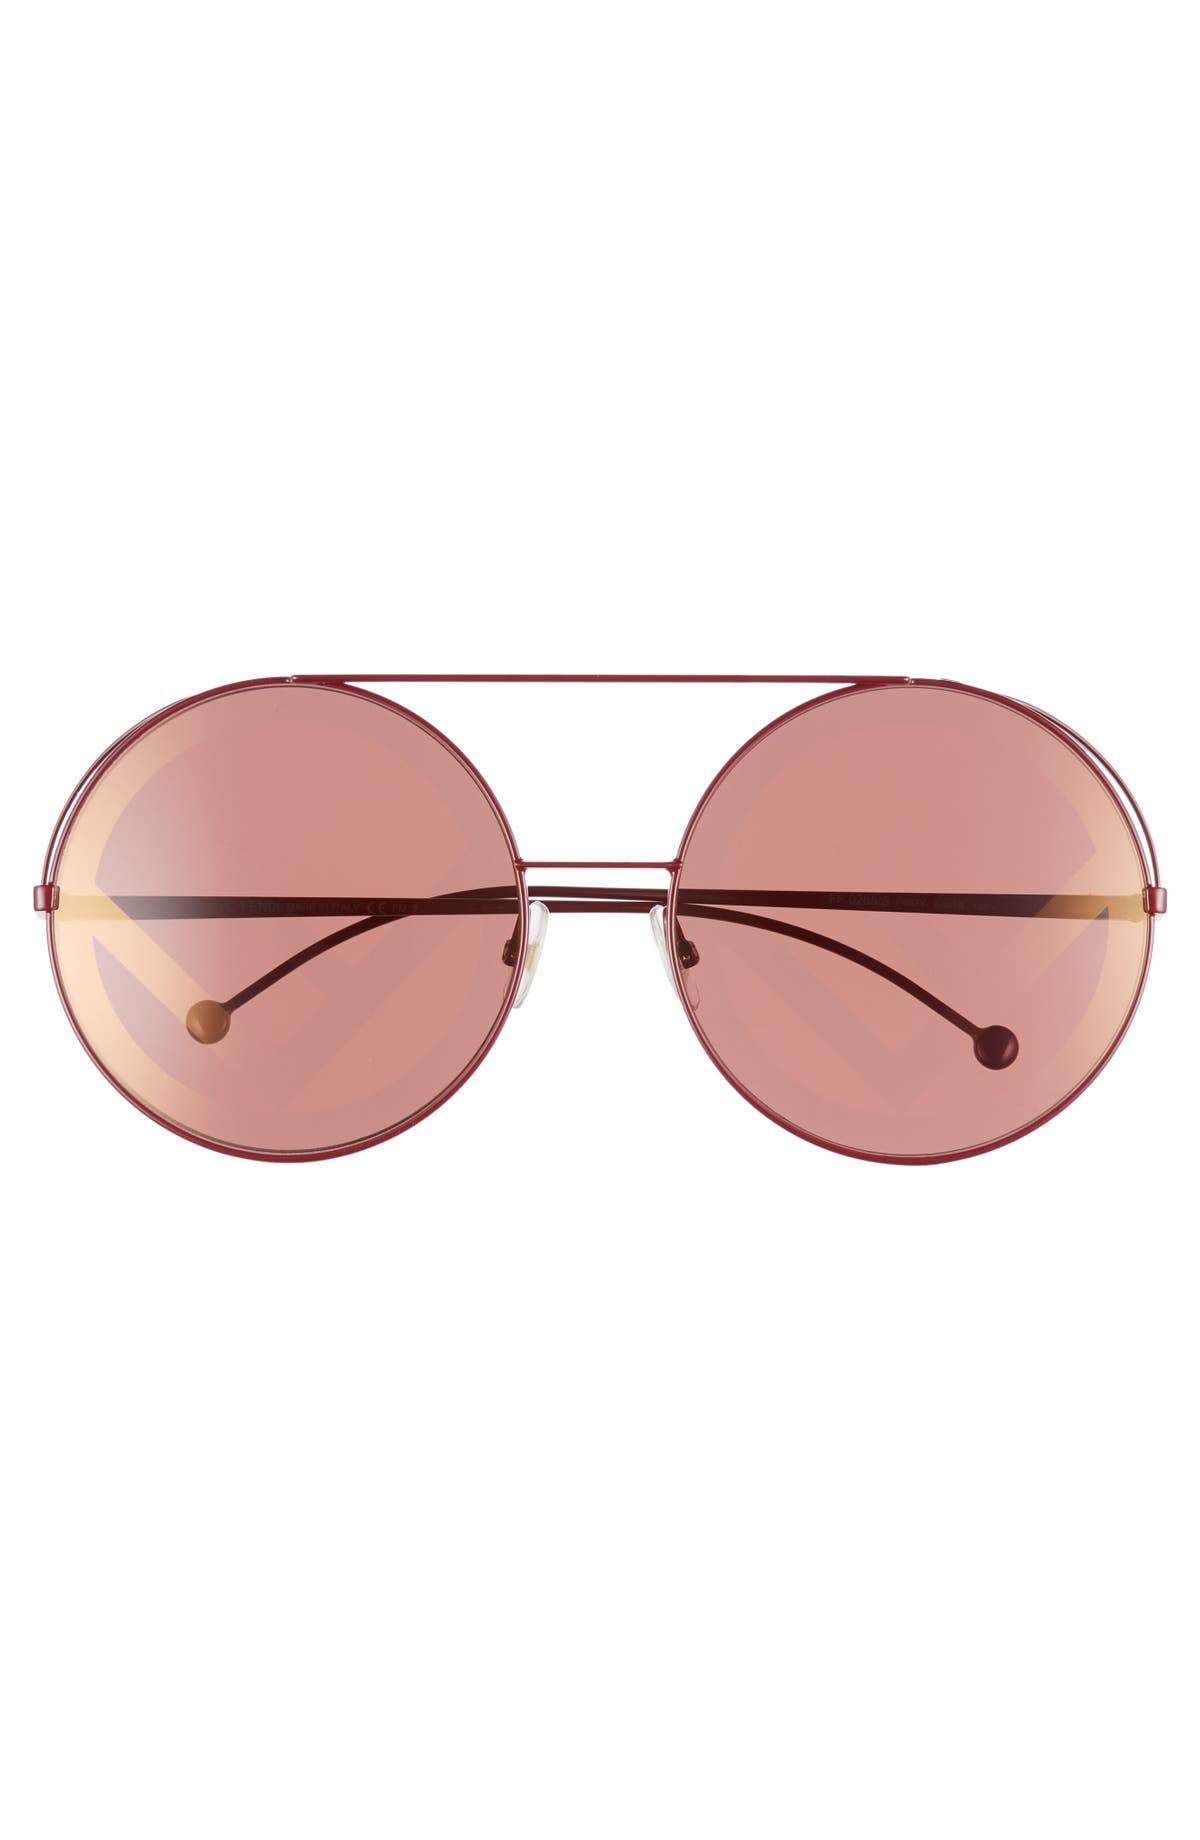 1a6d5e55a8535 Fendi Run Away 63mm Round Sunglasses